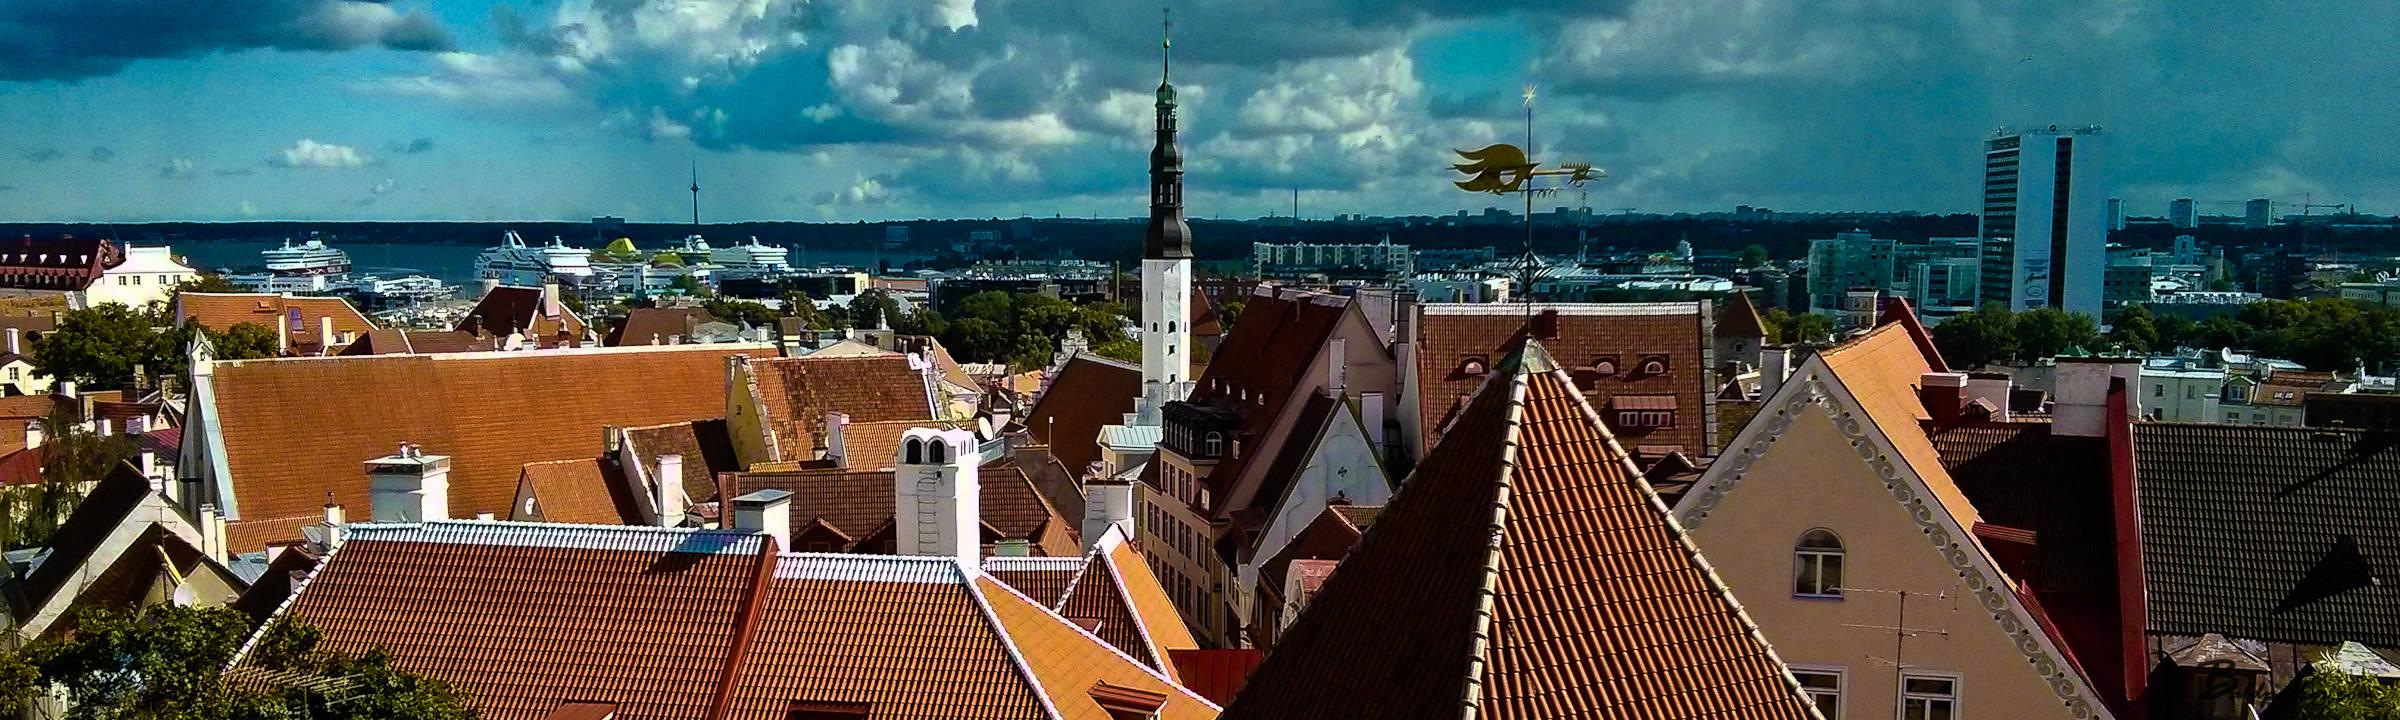 Estonia: Two Tourists in Tallinn